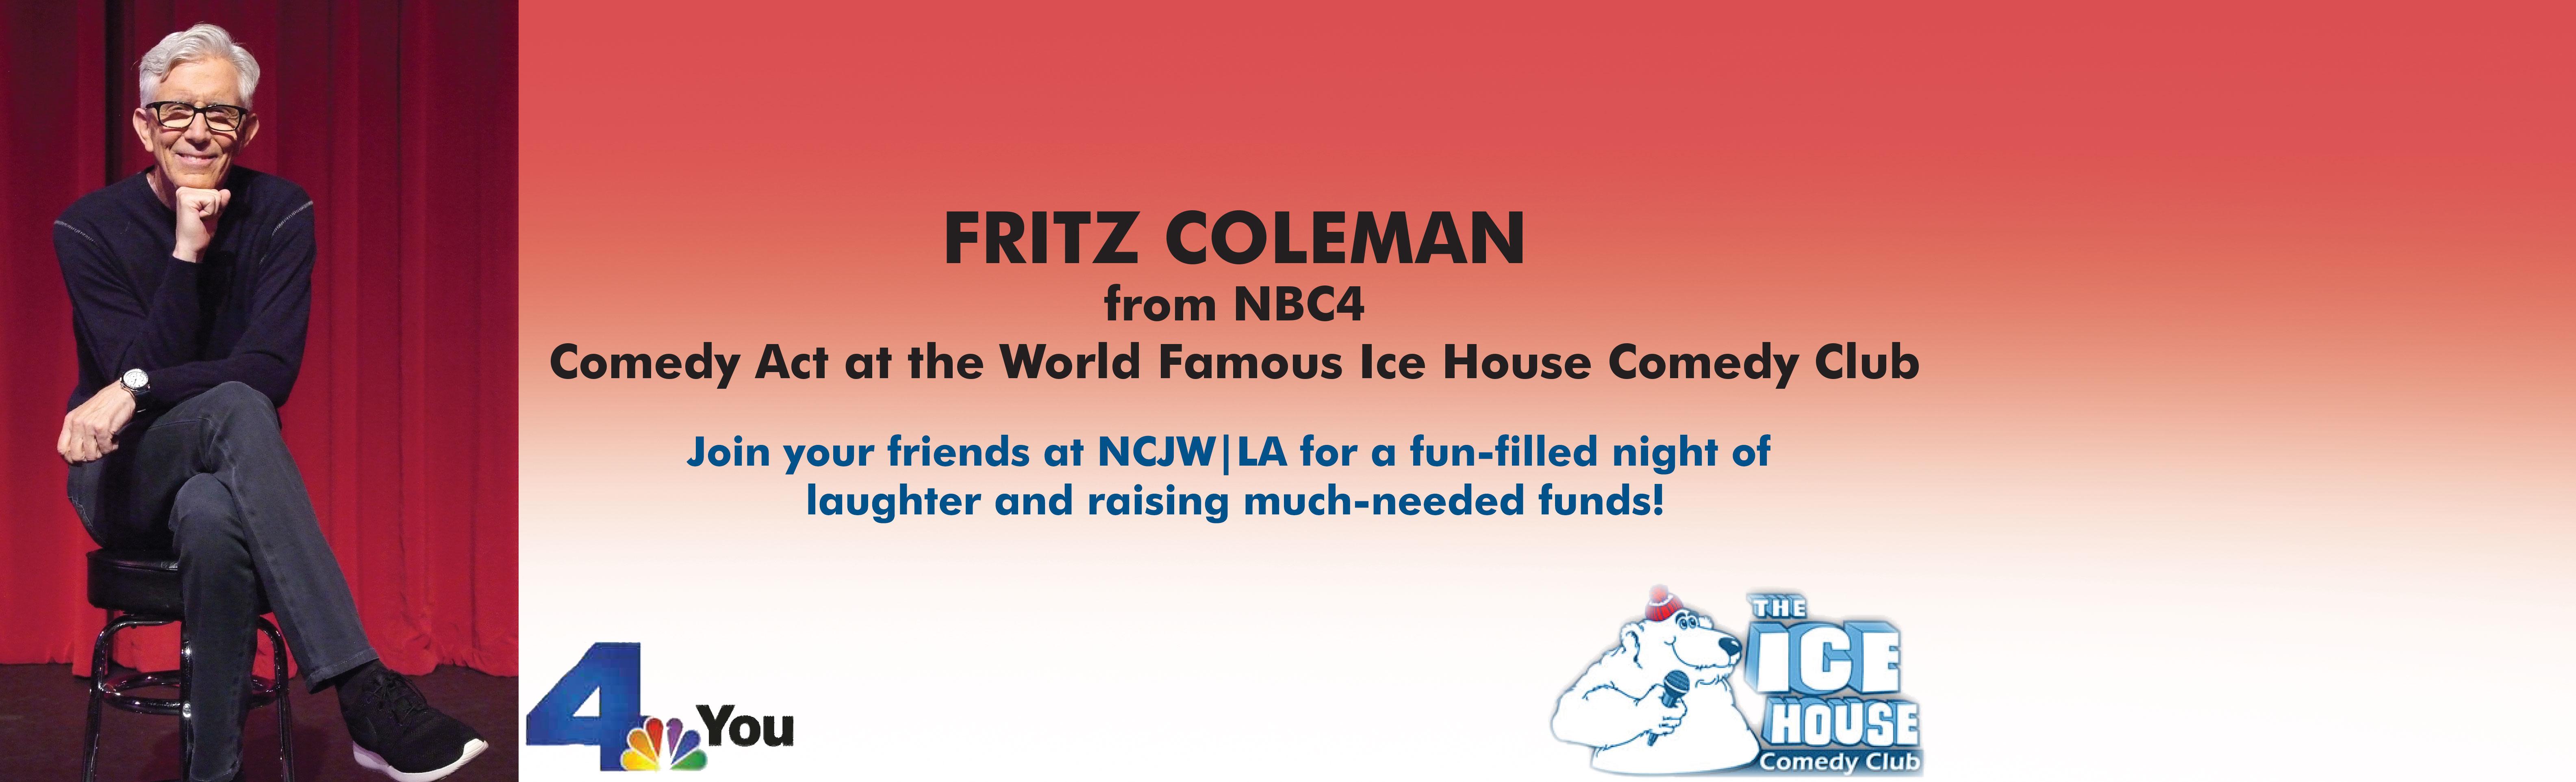 fritz-event-website-banner